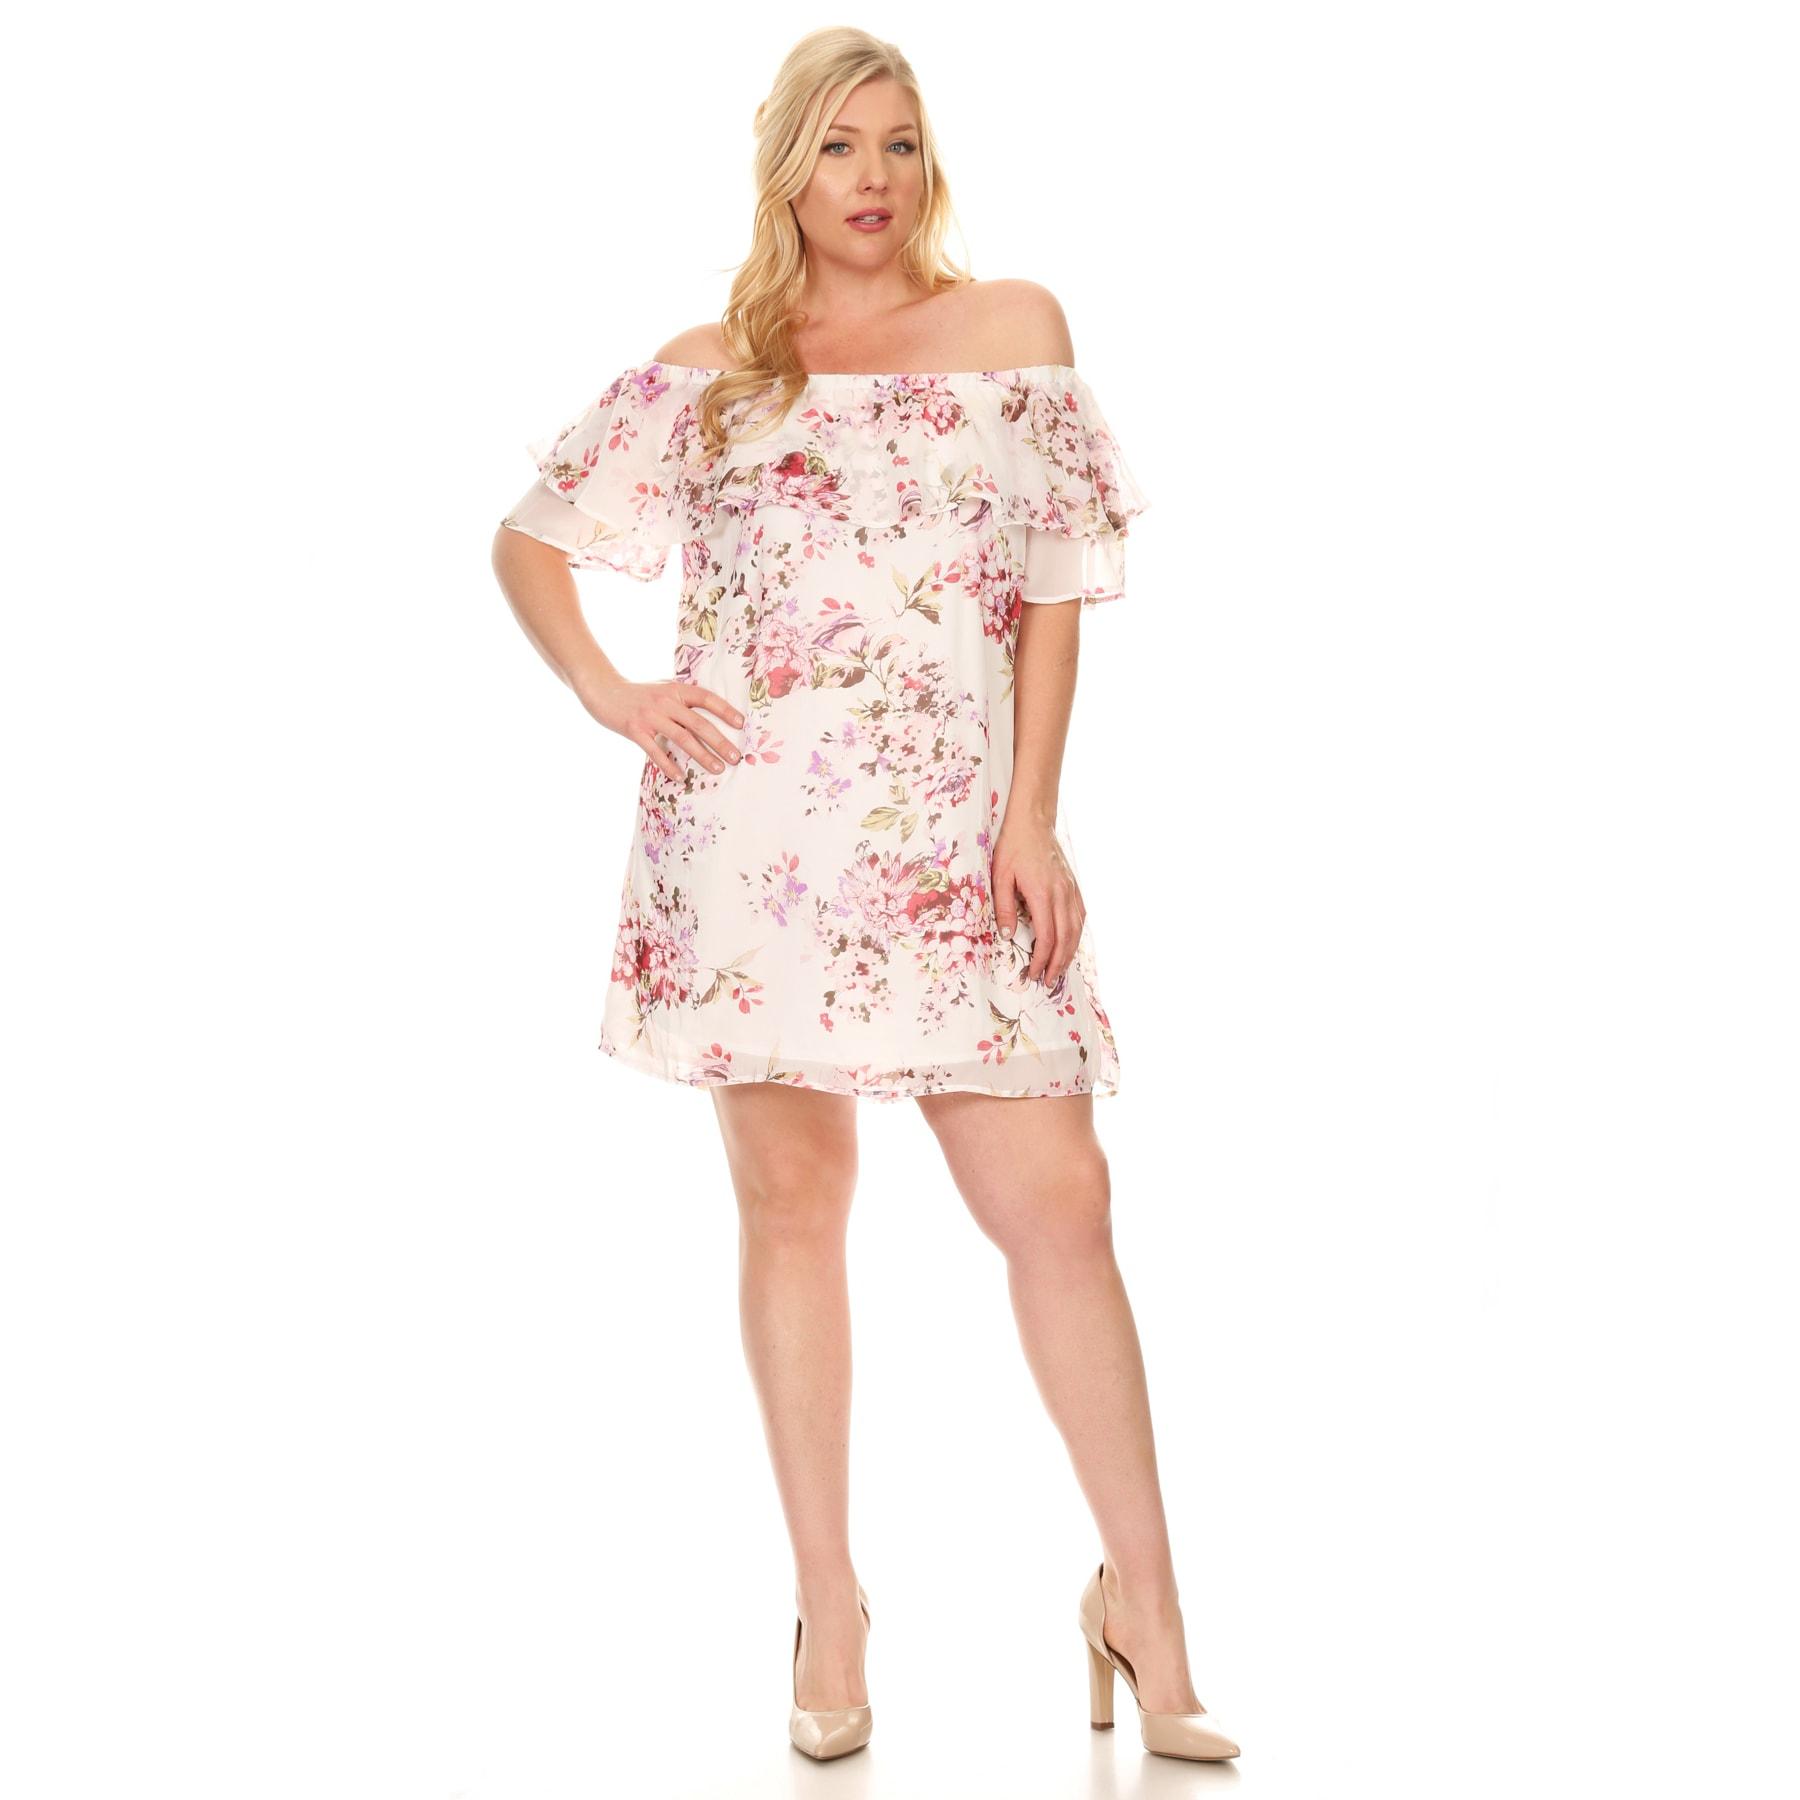 cb6f0ed3e2a Plus Size Floral Print Summer Dresses - Data Dynamic AG